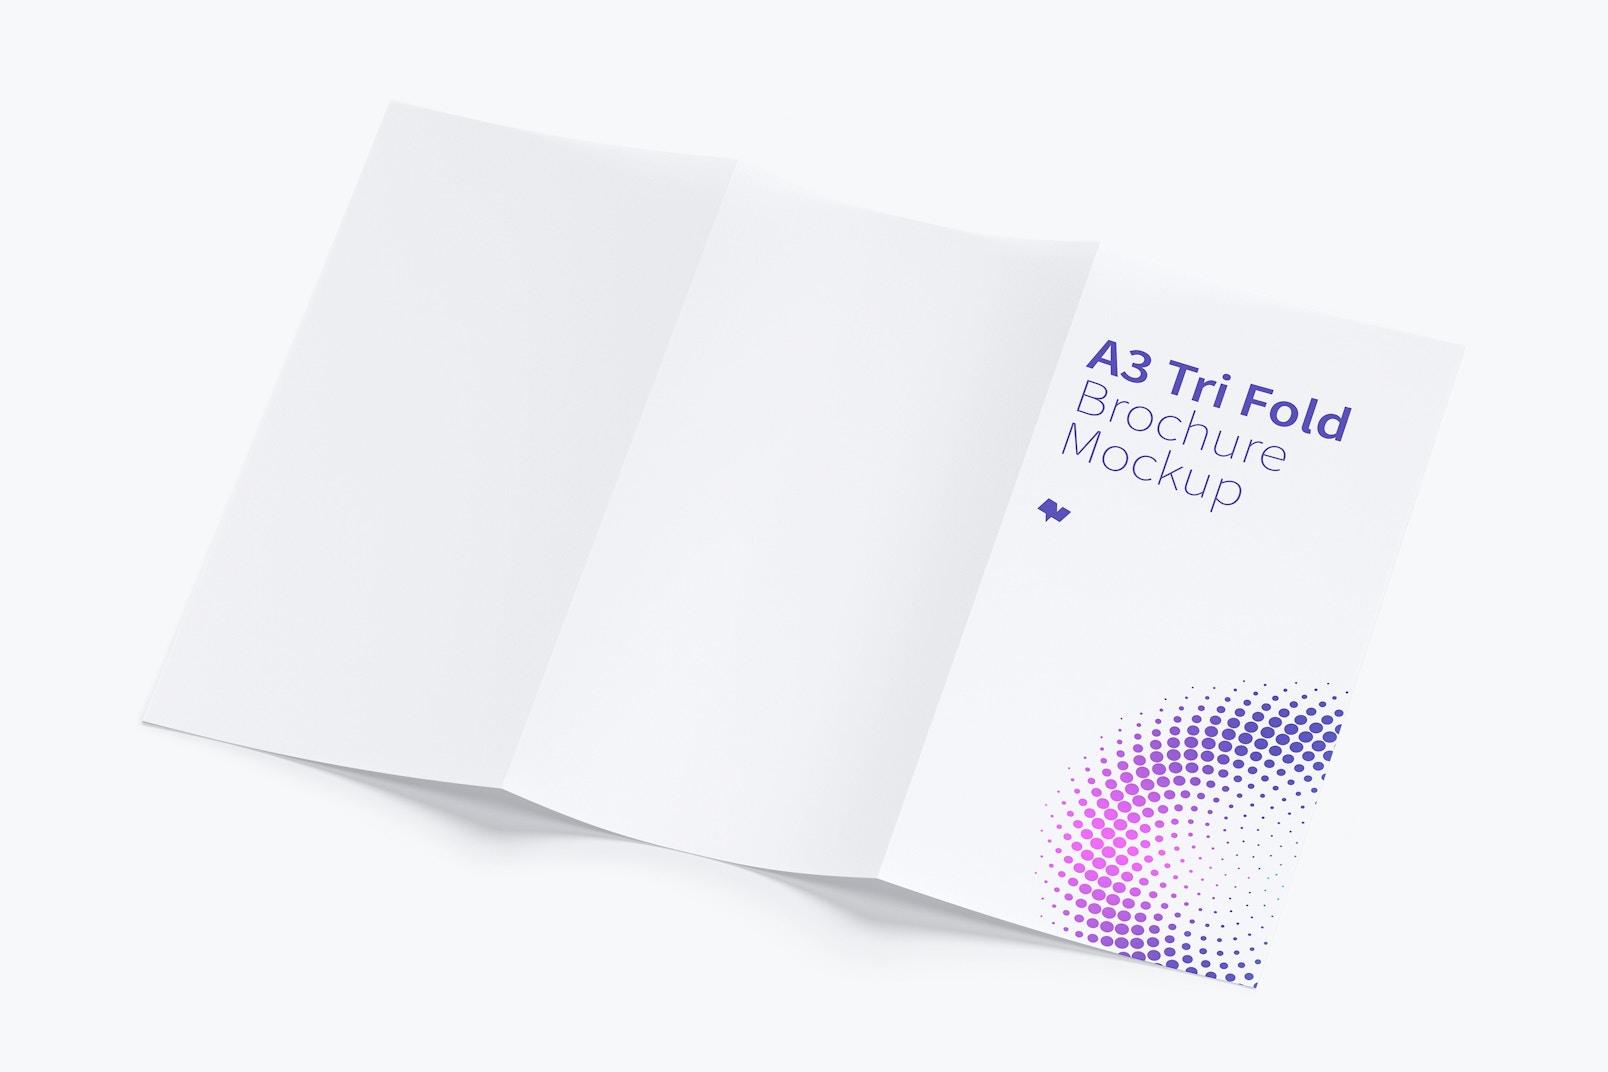 A3 Trifold Brochure Mockup 02